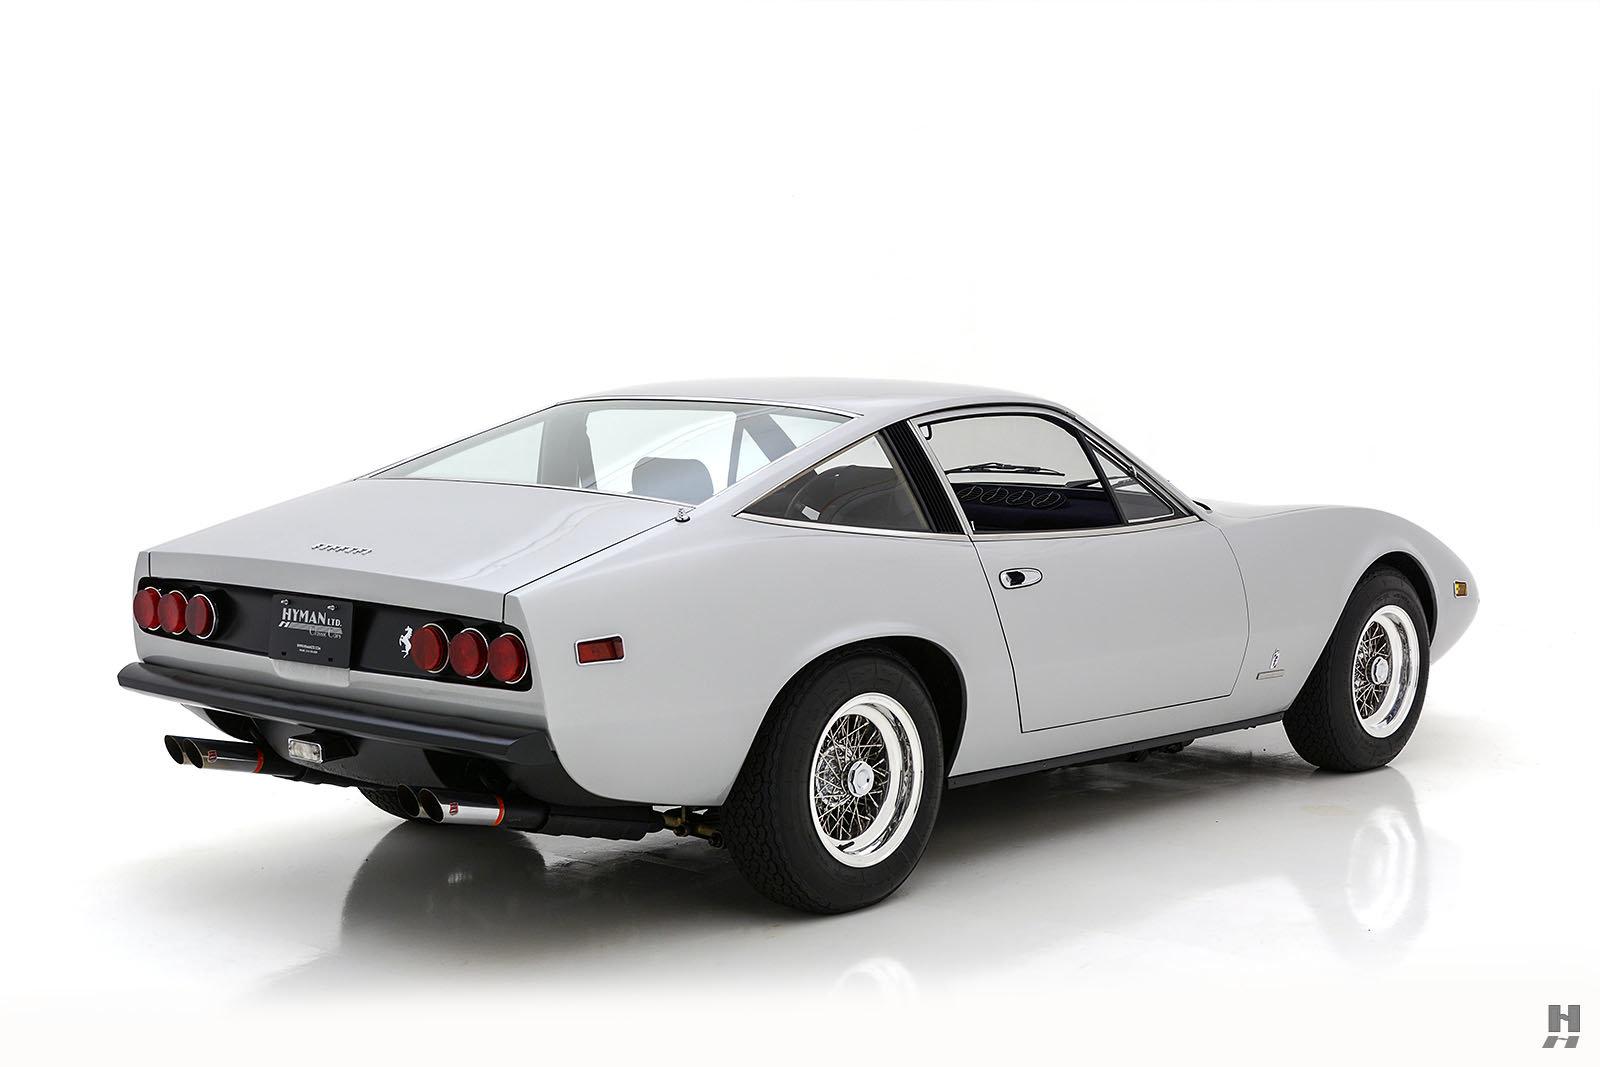 1972 FERRARI 365 GTC/4 COUPE For Sale (picture 5 of 6)